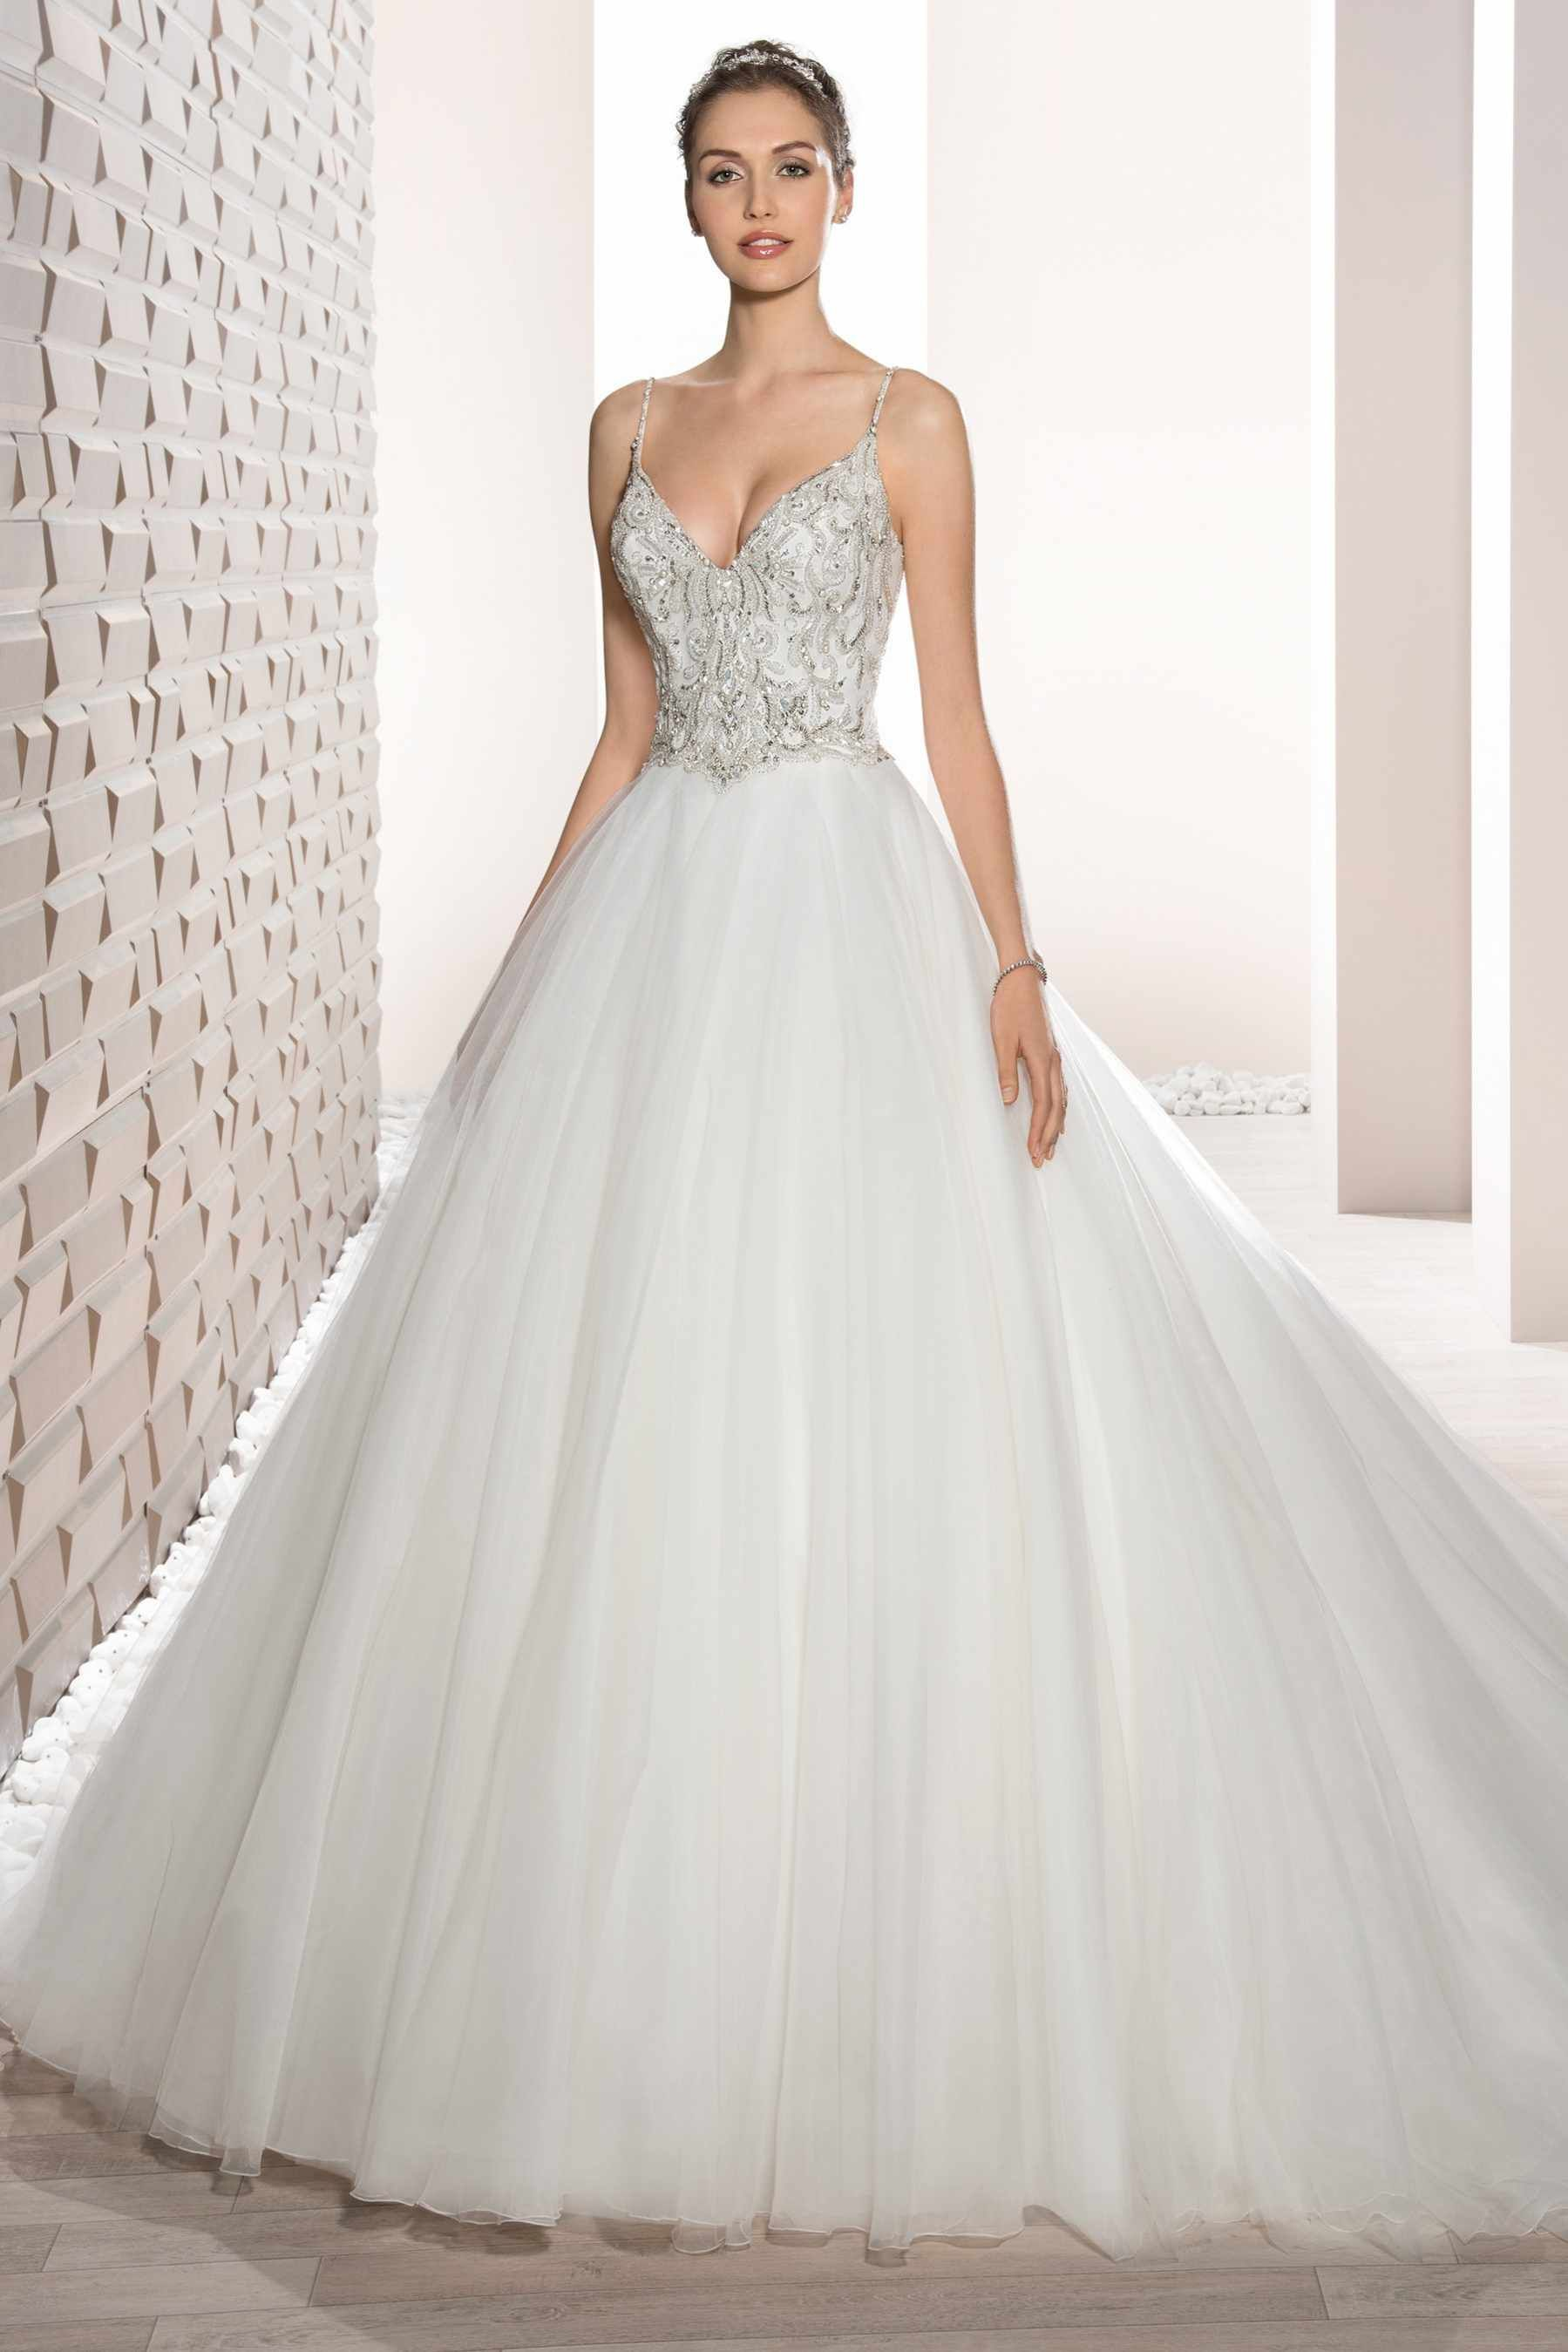 Demetrios wedding dress style shimmering beaded embroidery